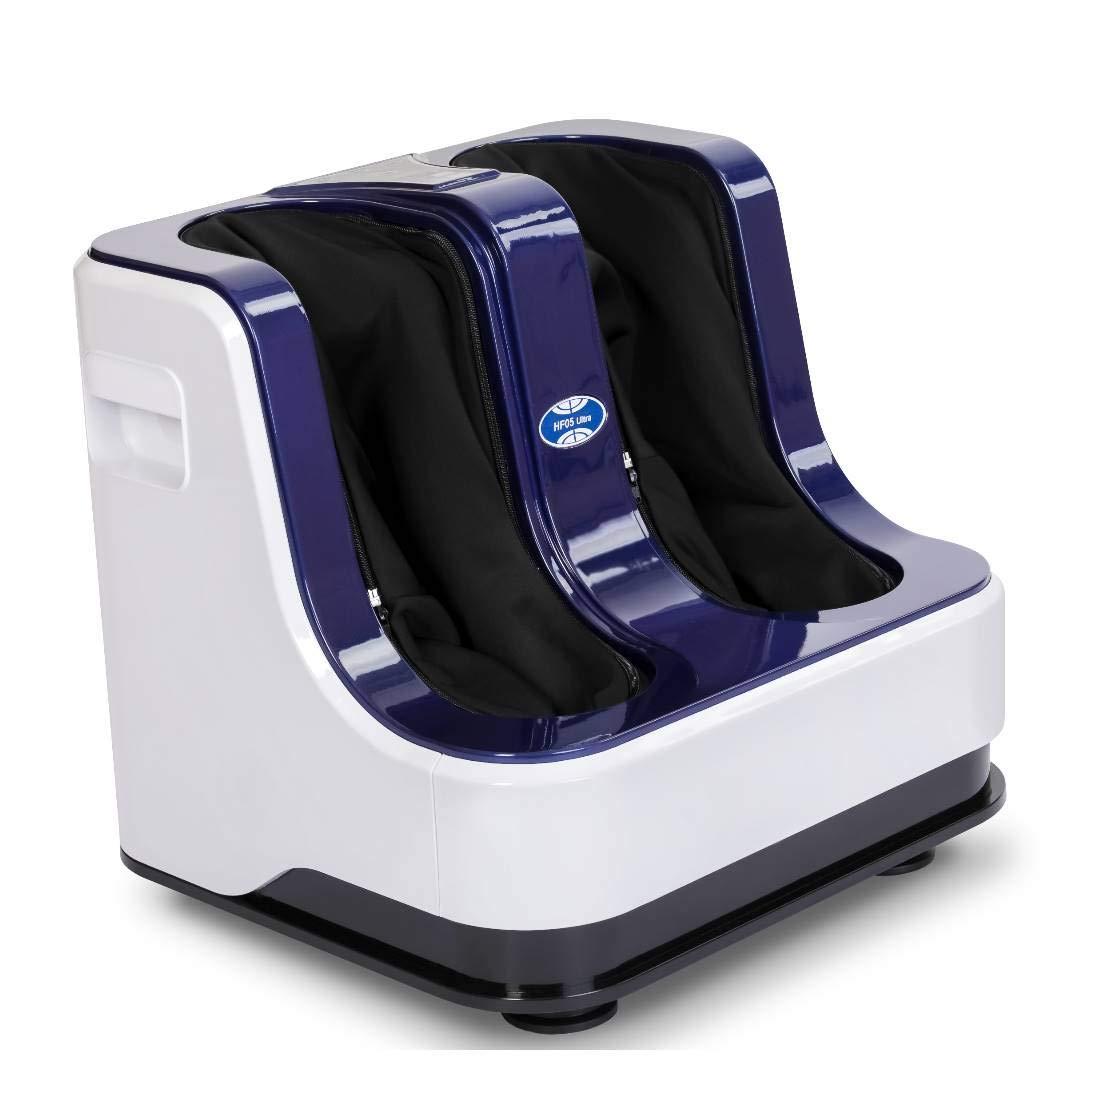 JSB HF05 Ultra Leg Massager for Pain Relief in Foot & Calf